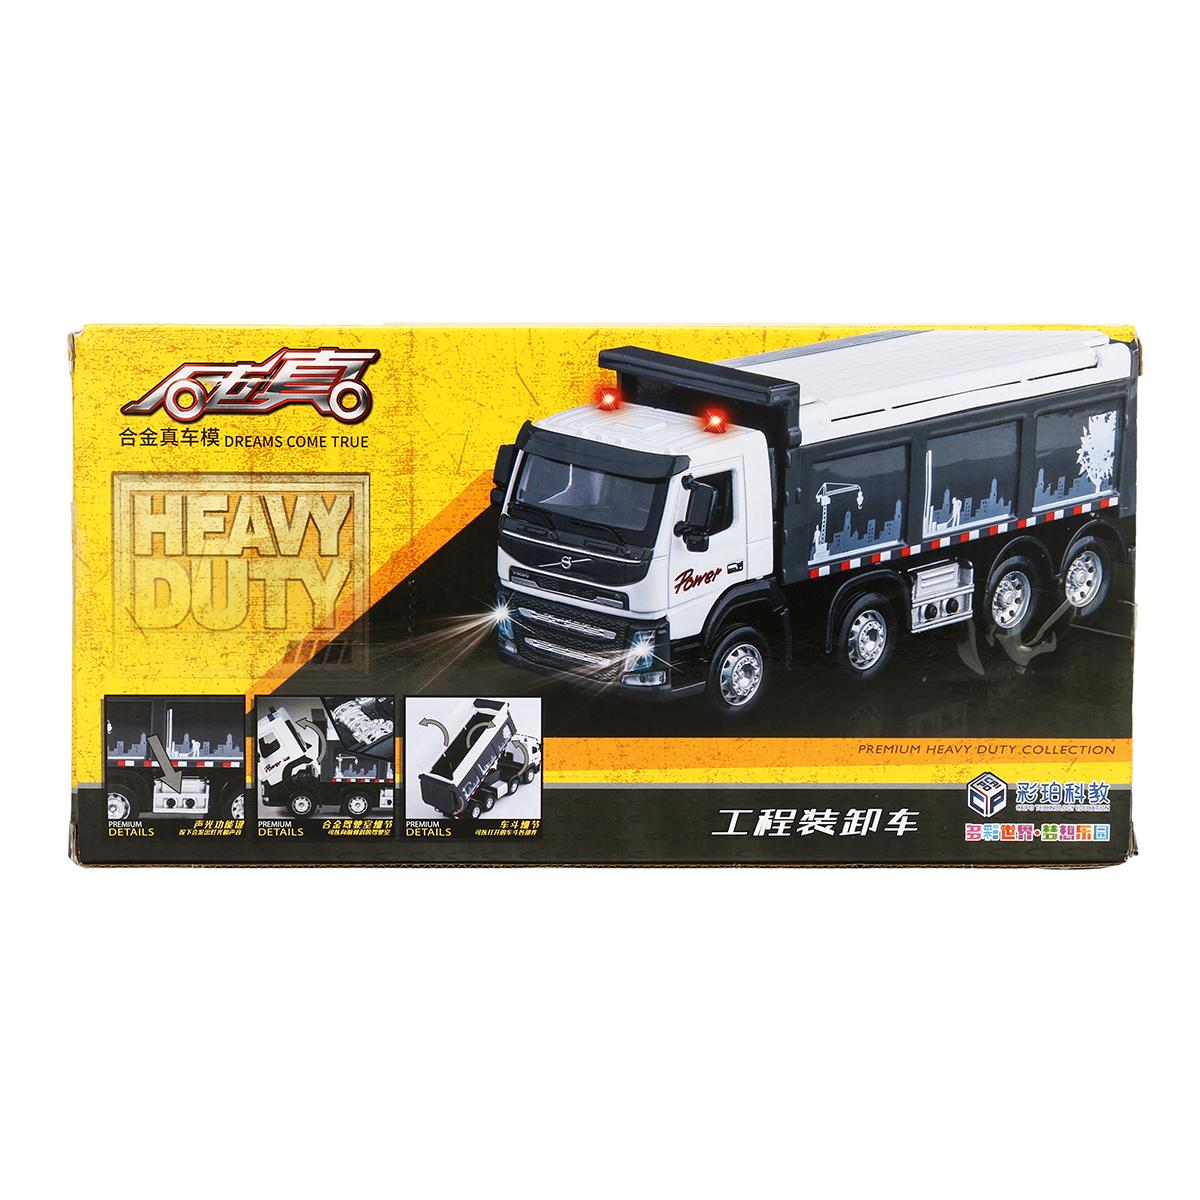 Engineering Car Sound & Light 1:50 Scale Diecast Model Dump Truck Toy